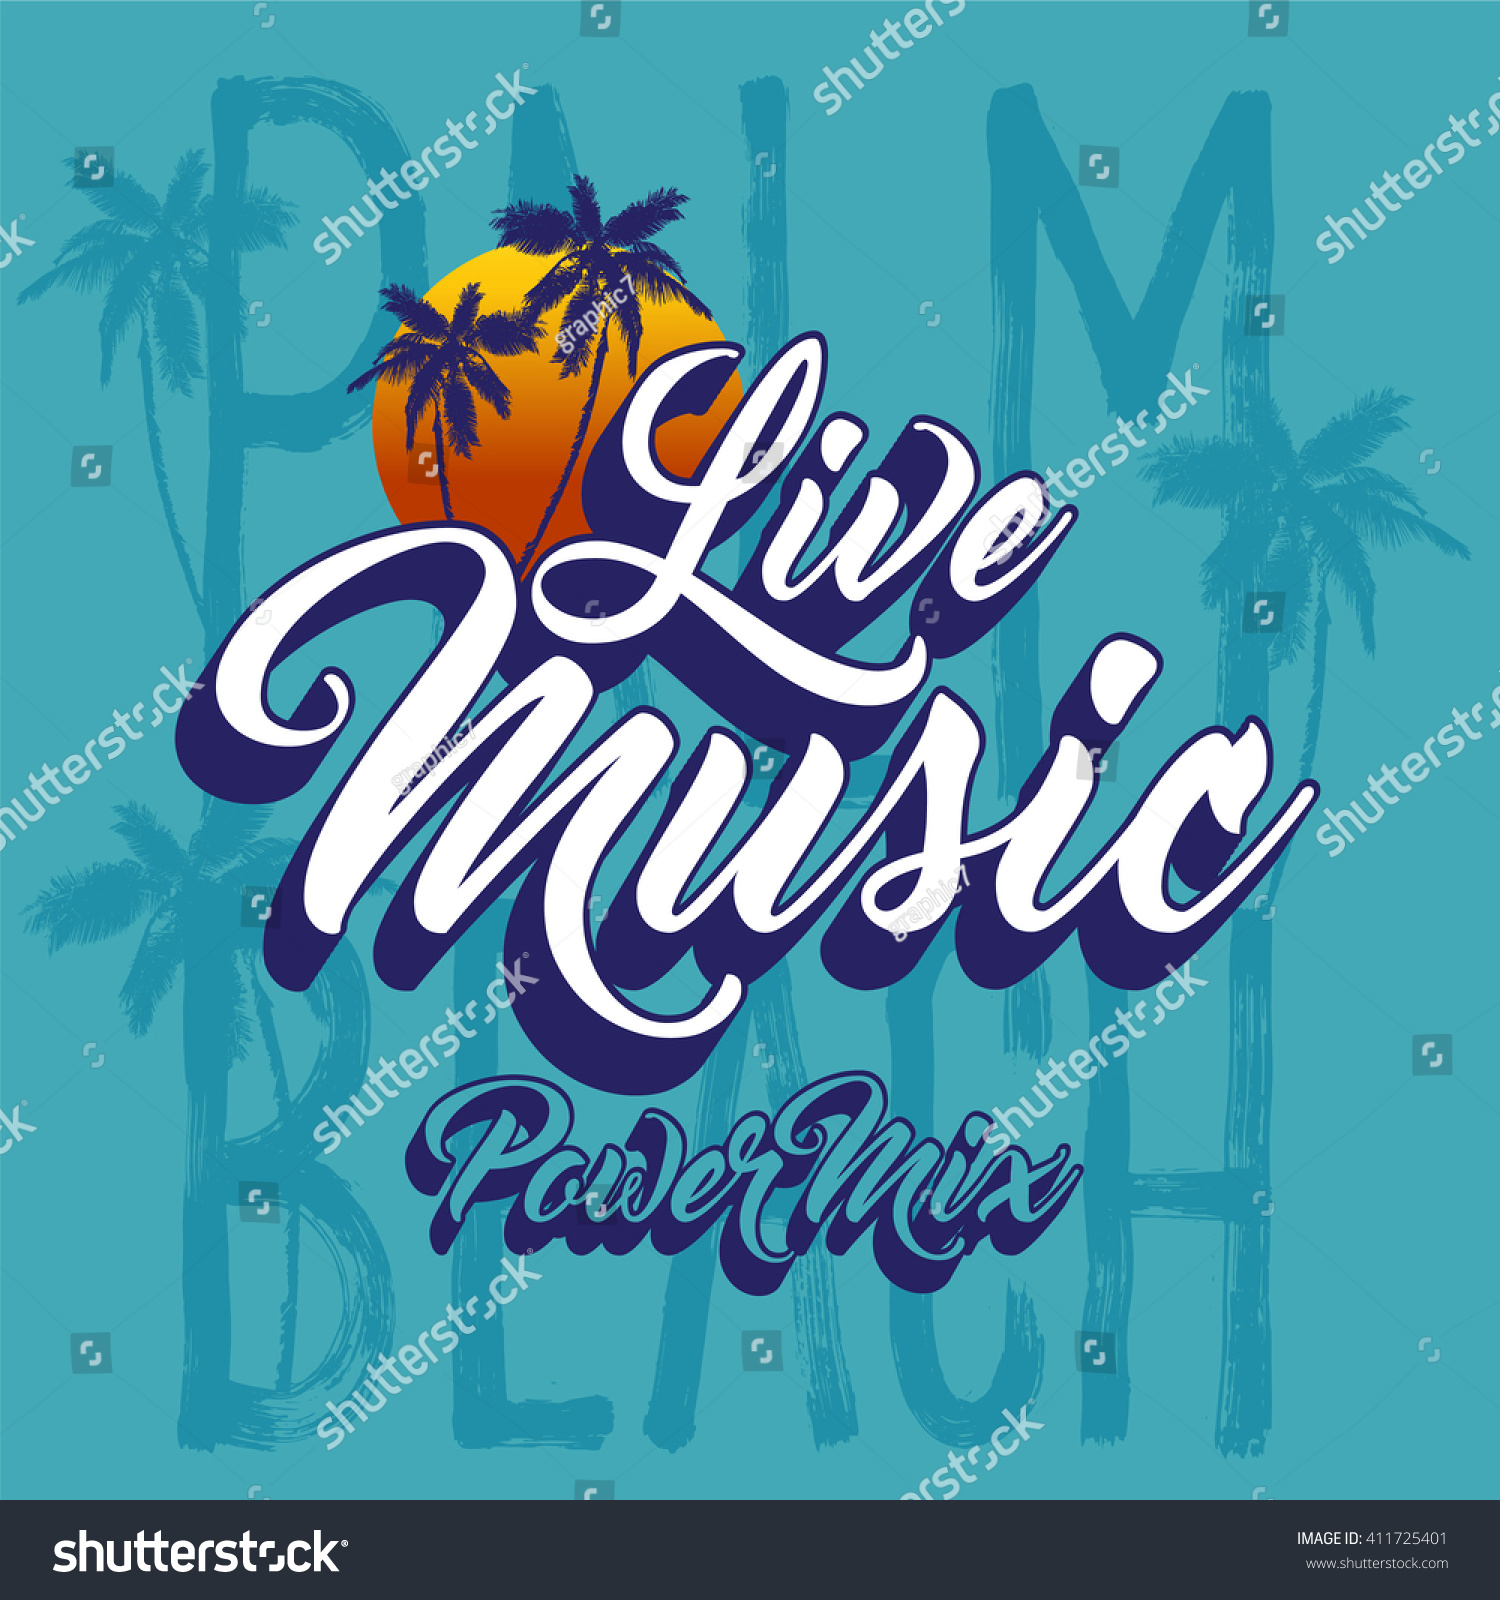 Design t shirt artwork - Slogan Apparel Graphic Design Idea Live Music Apparel Graphic Summer Collection T